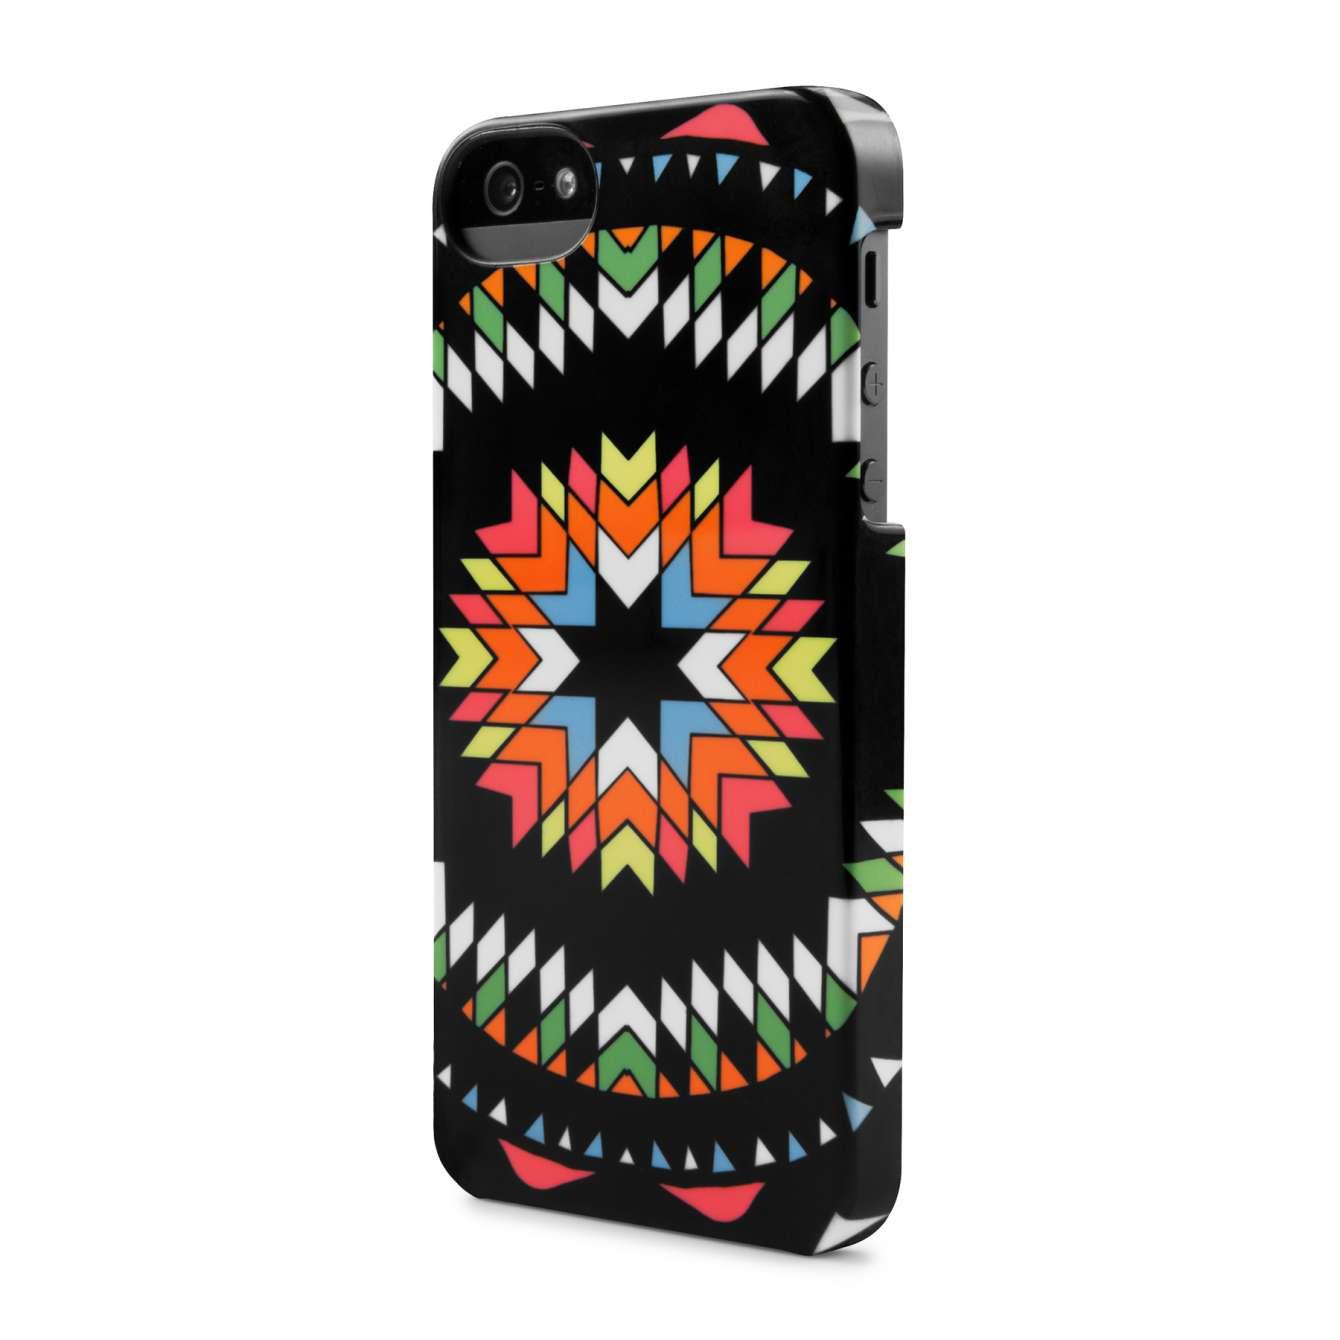 Mara Hoffman x Incase iPhone 5 Snap Cases-2